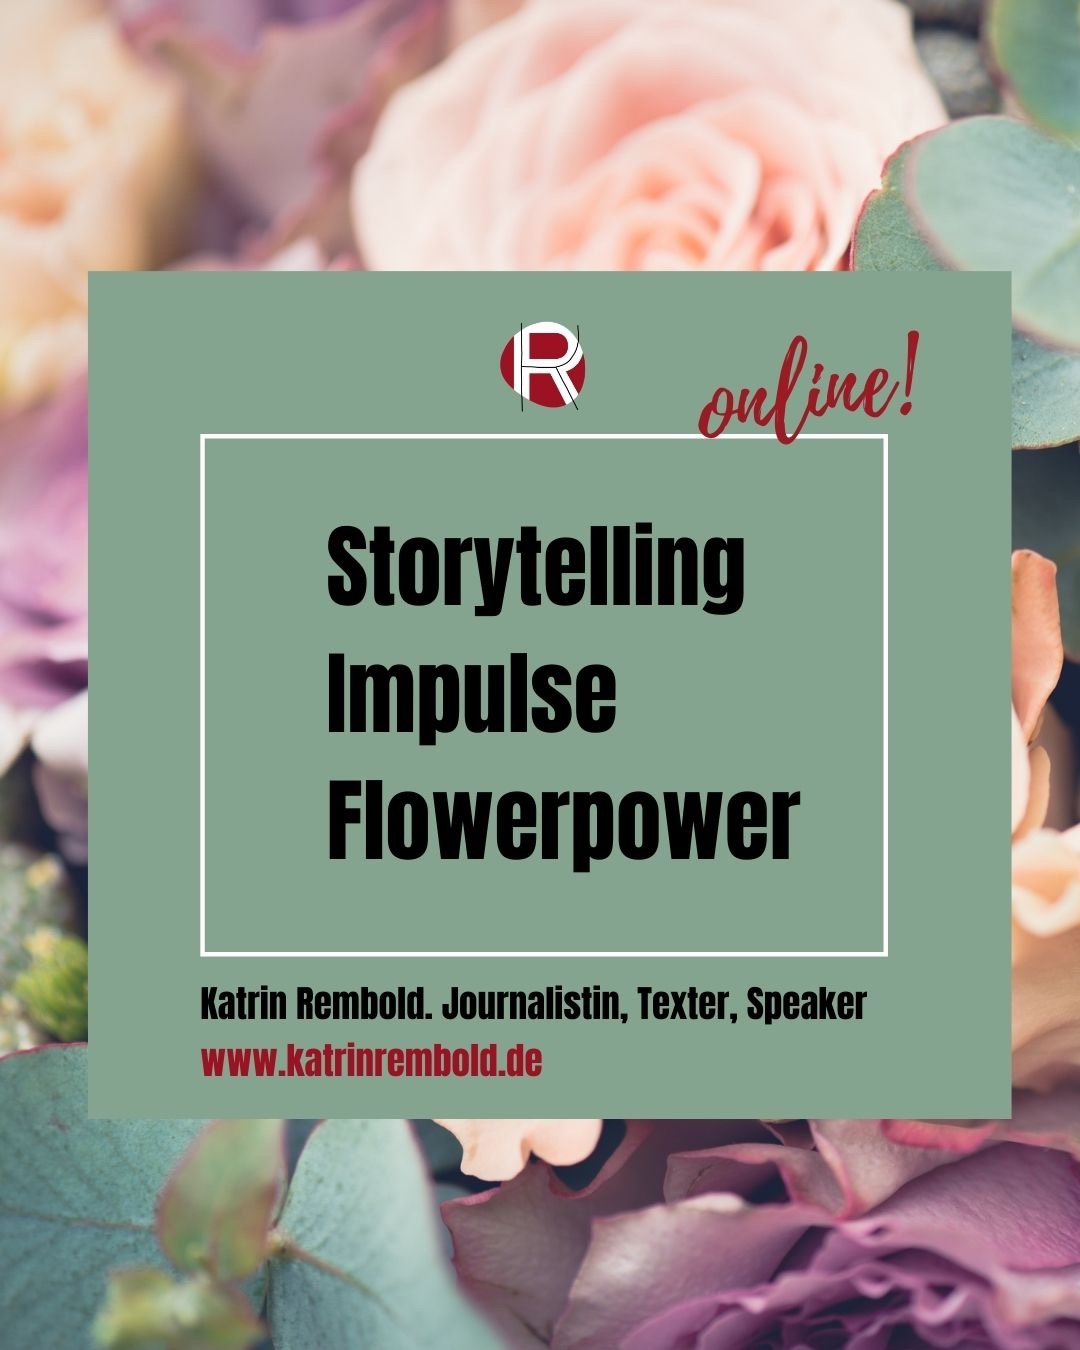 Katrin Rembold, Journalistin & Texterin. Online Workshop Storytelling Impulse flowerpower & Floristik